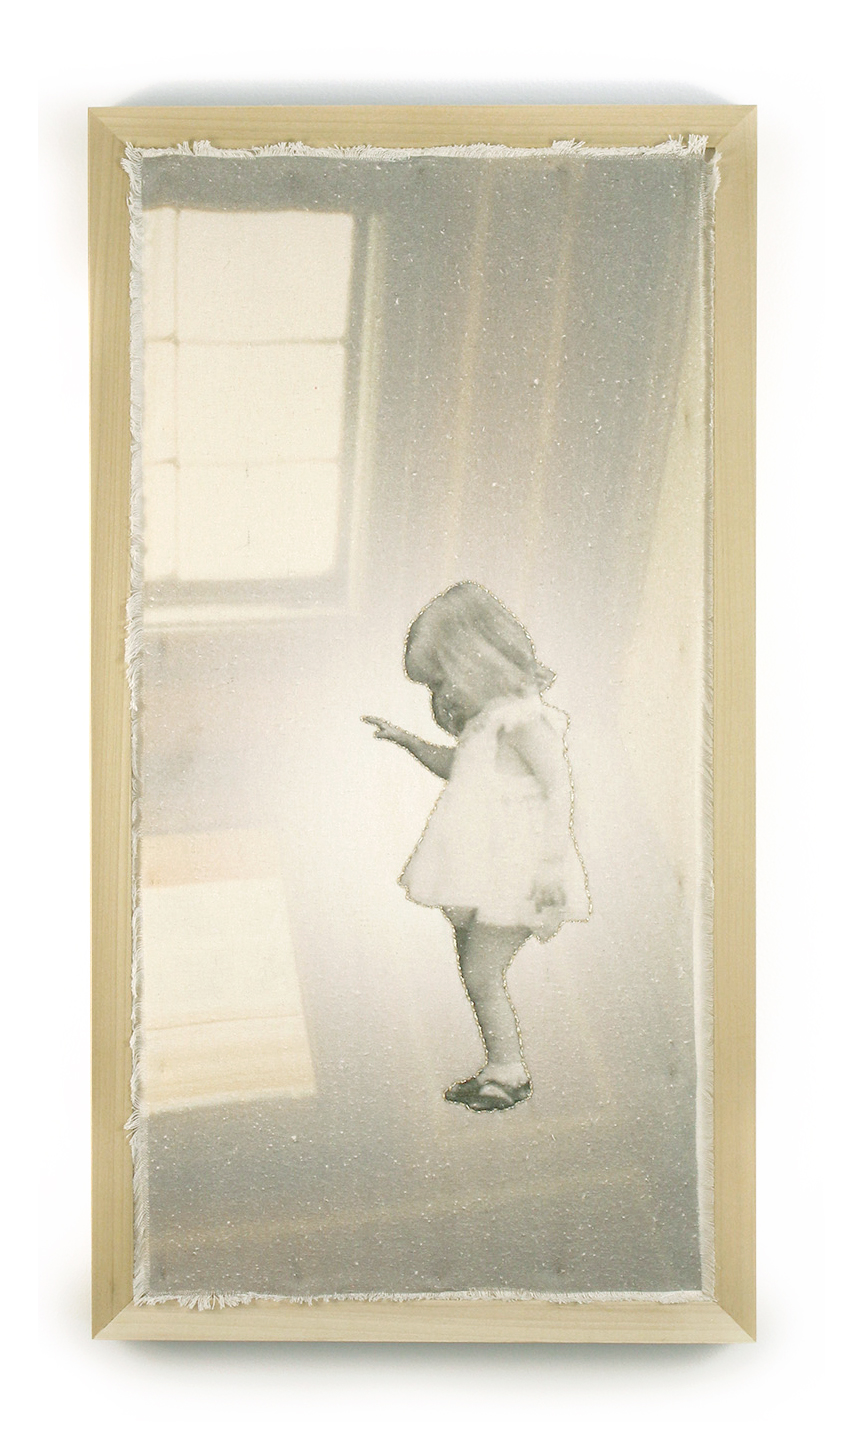 Shelley-Smith-What-The-Dream-Said-3.jpg